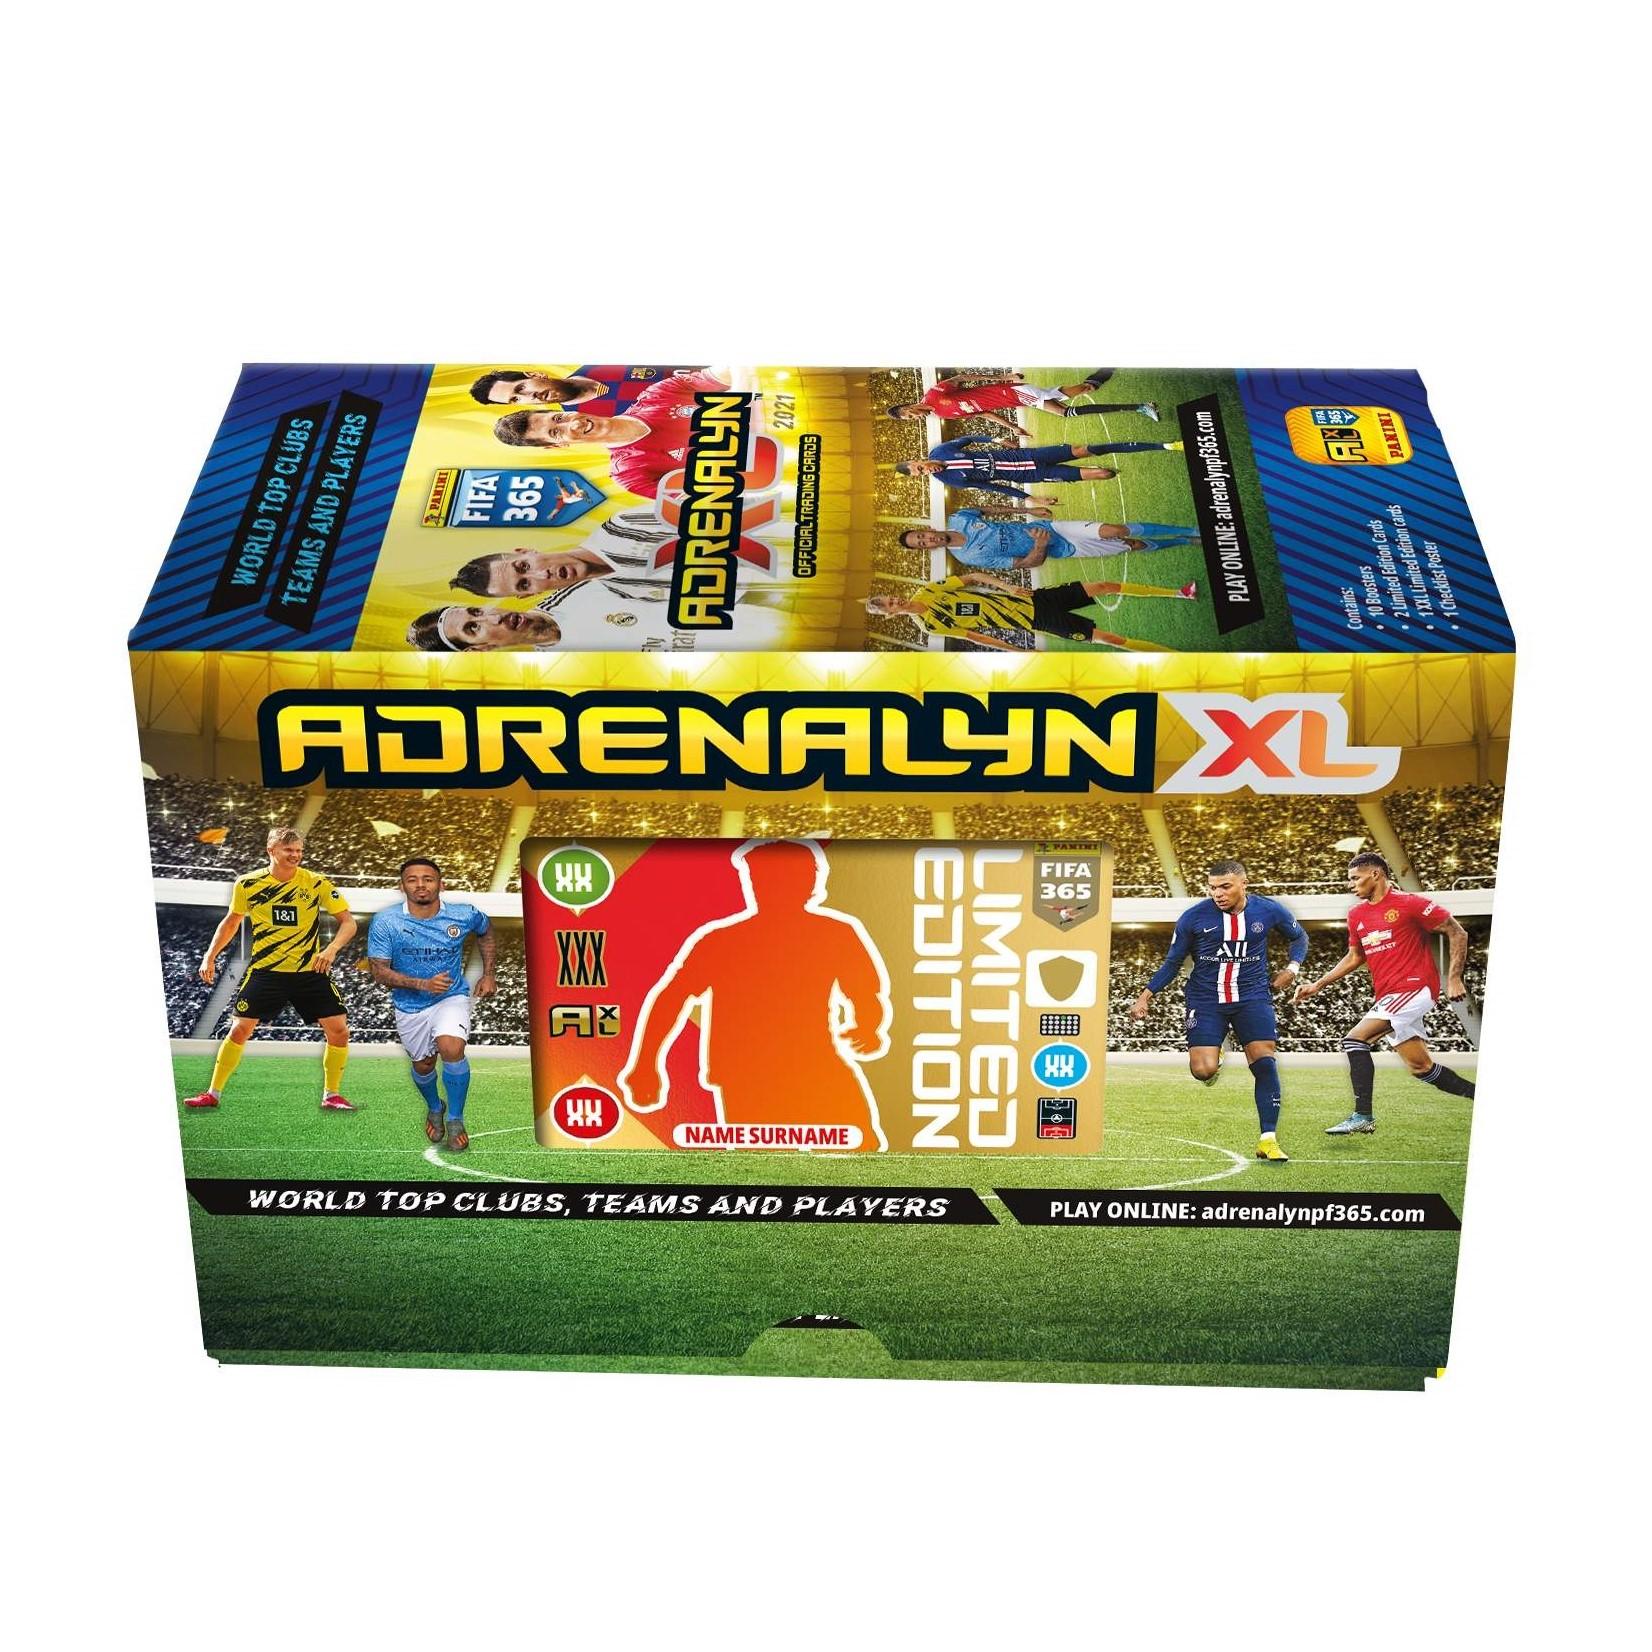 adrenalyn_xl_fifa_365_2021_gift_box-presentbox-2021